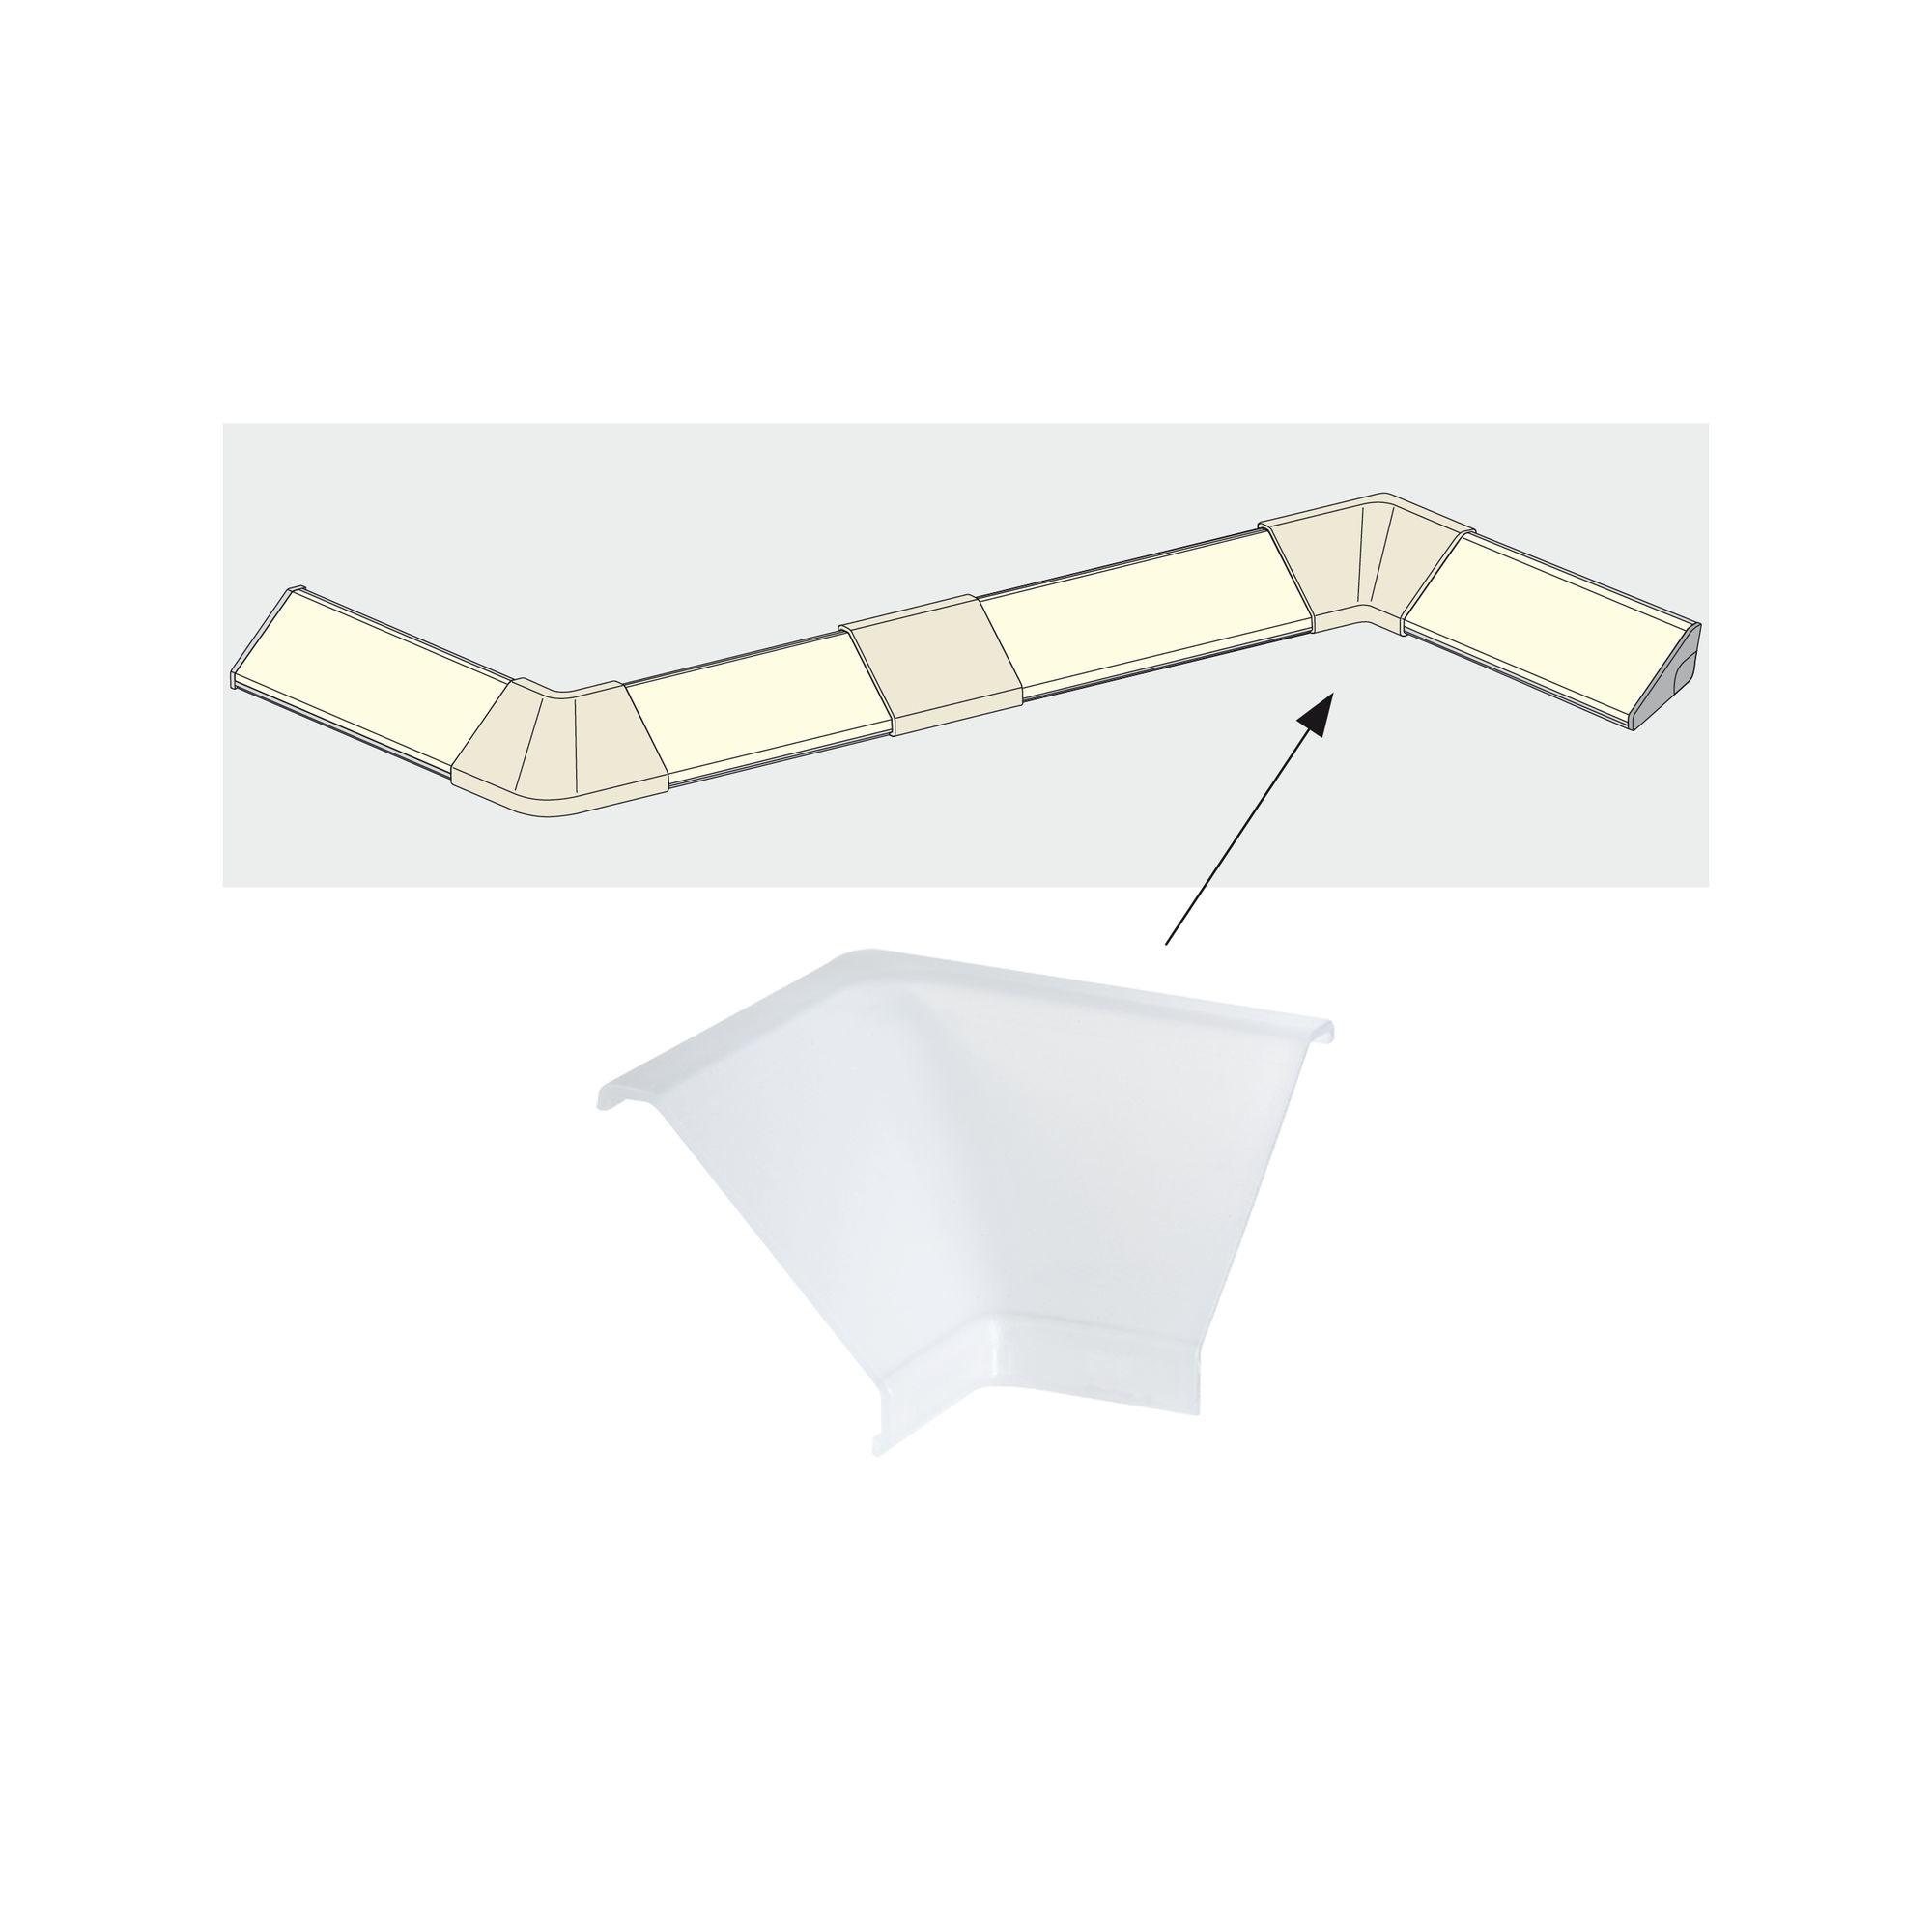 Paulmann Delta Profil Inside Corner 2er Pack Satin, Kunststoff